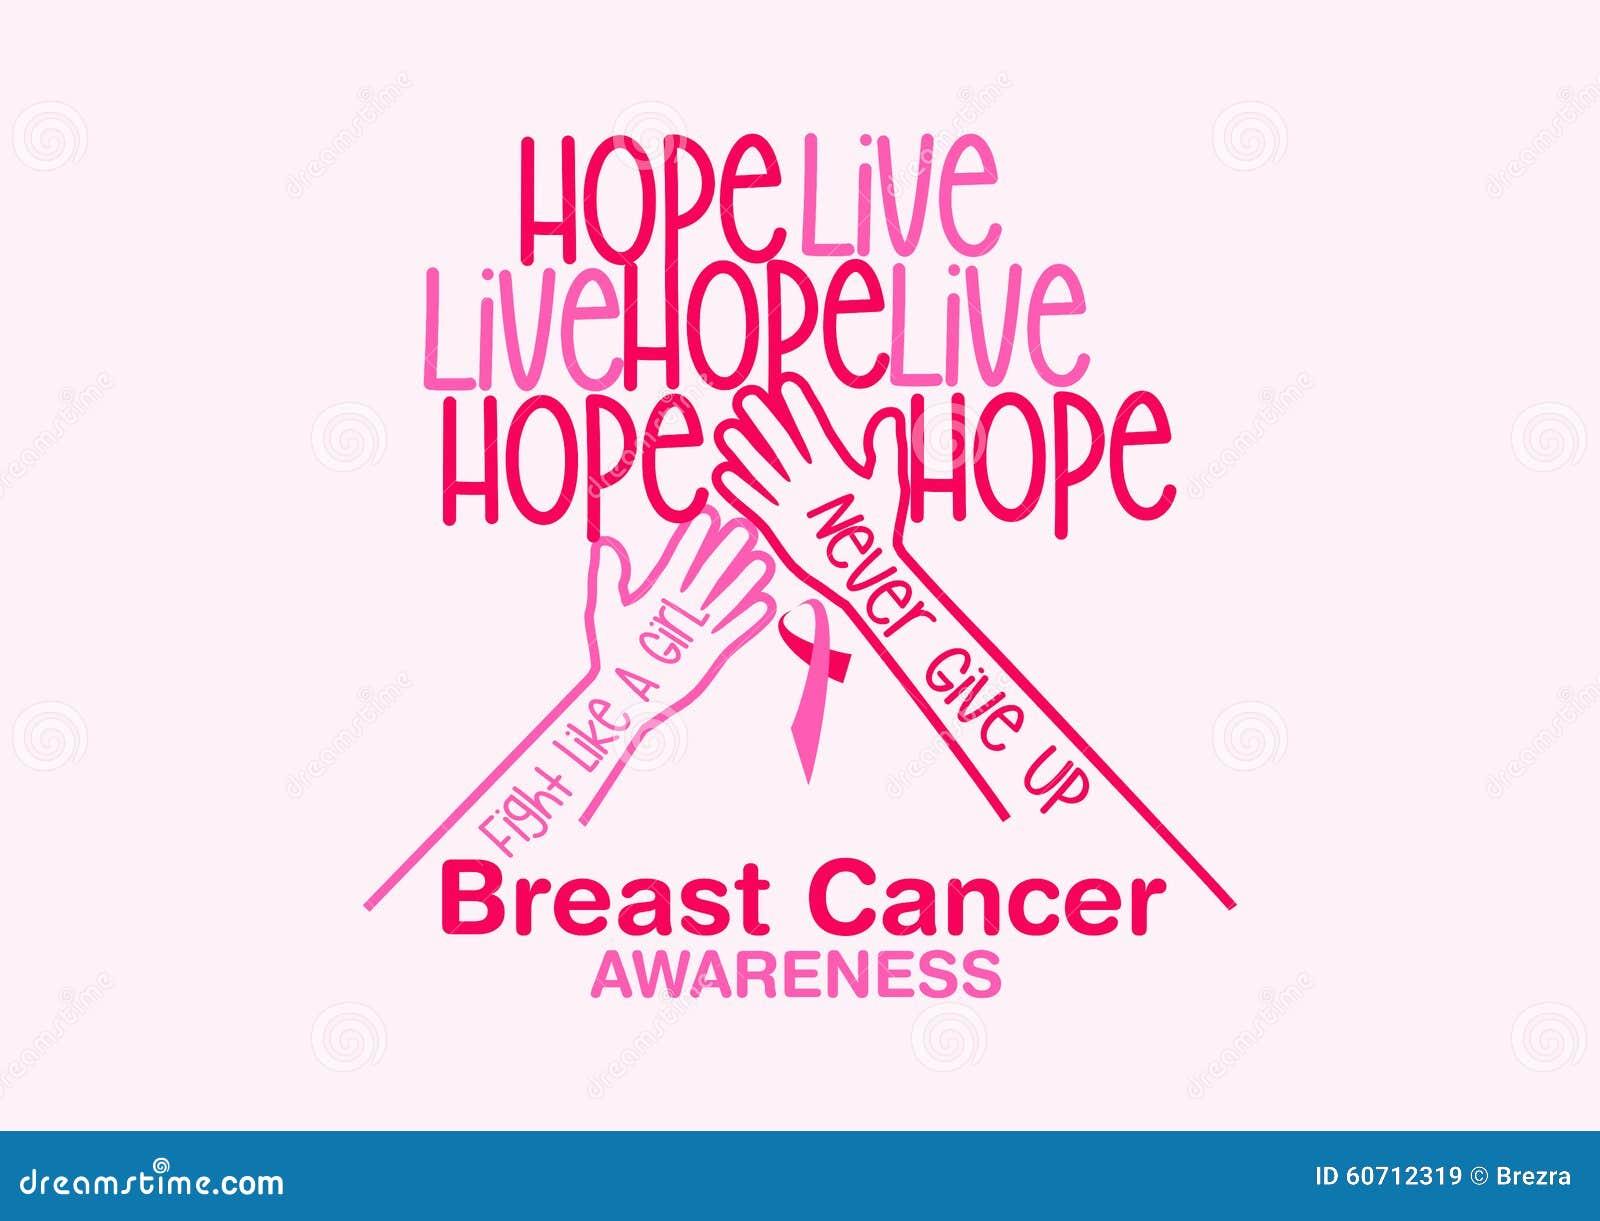 Breast cancer awareness vector design